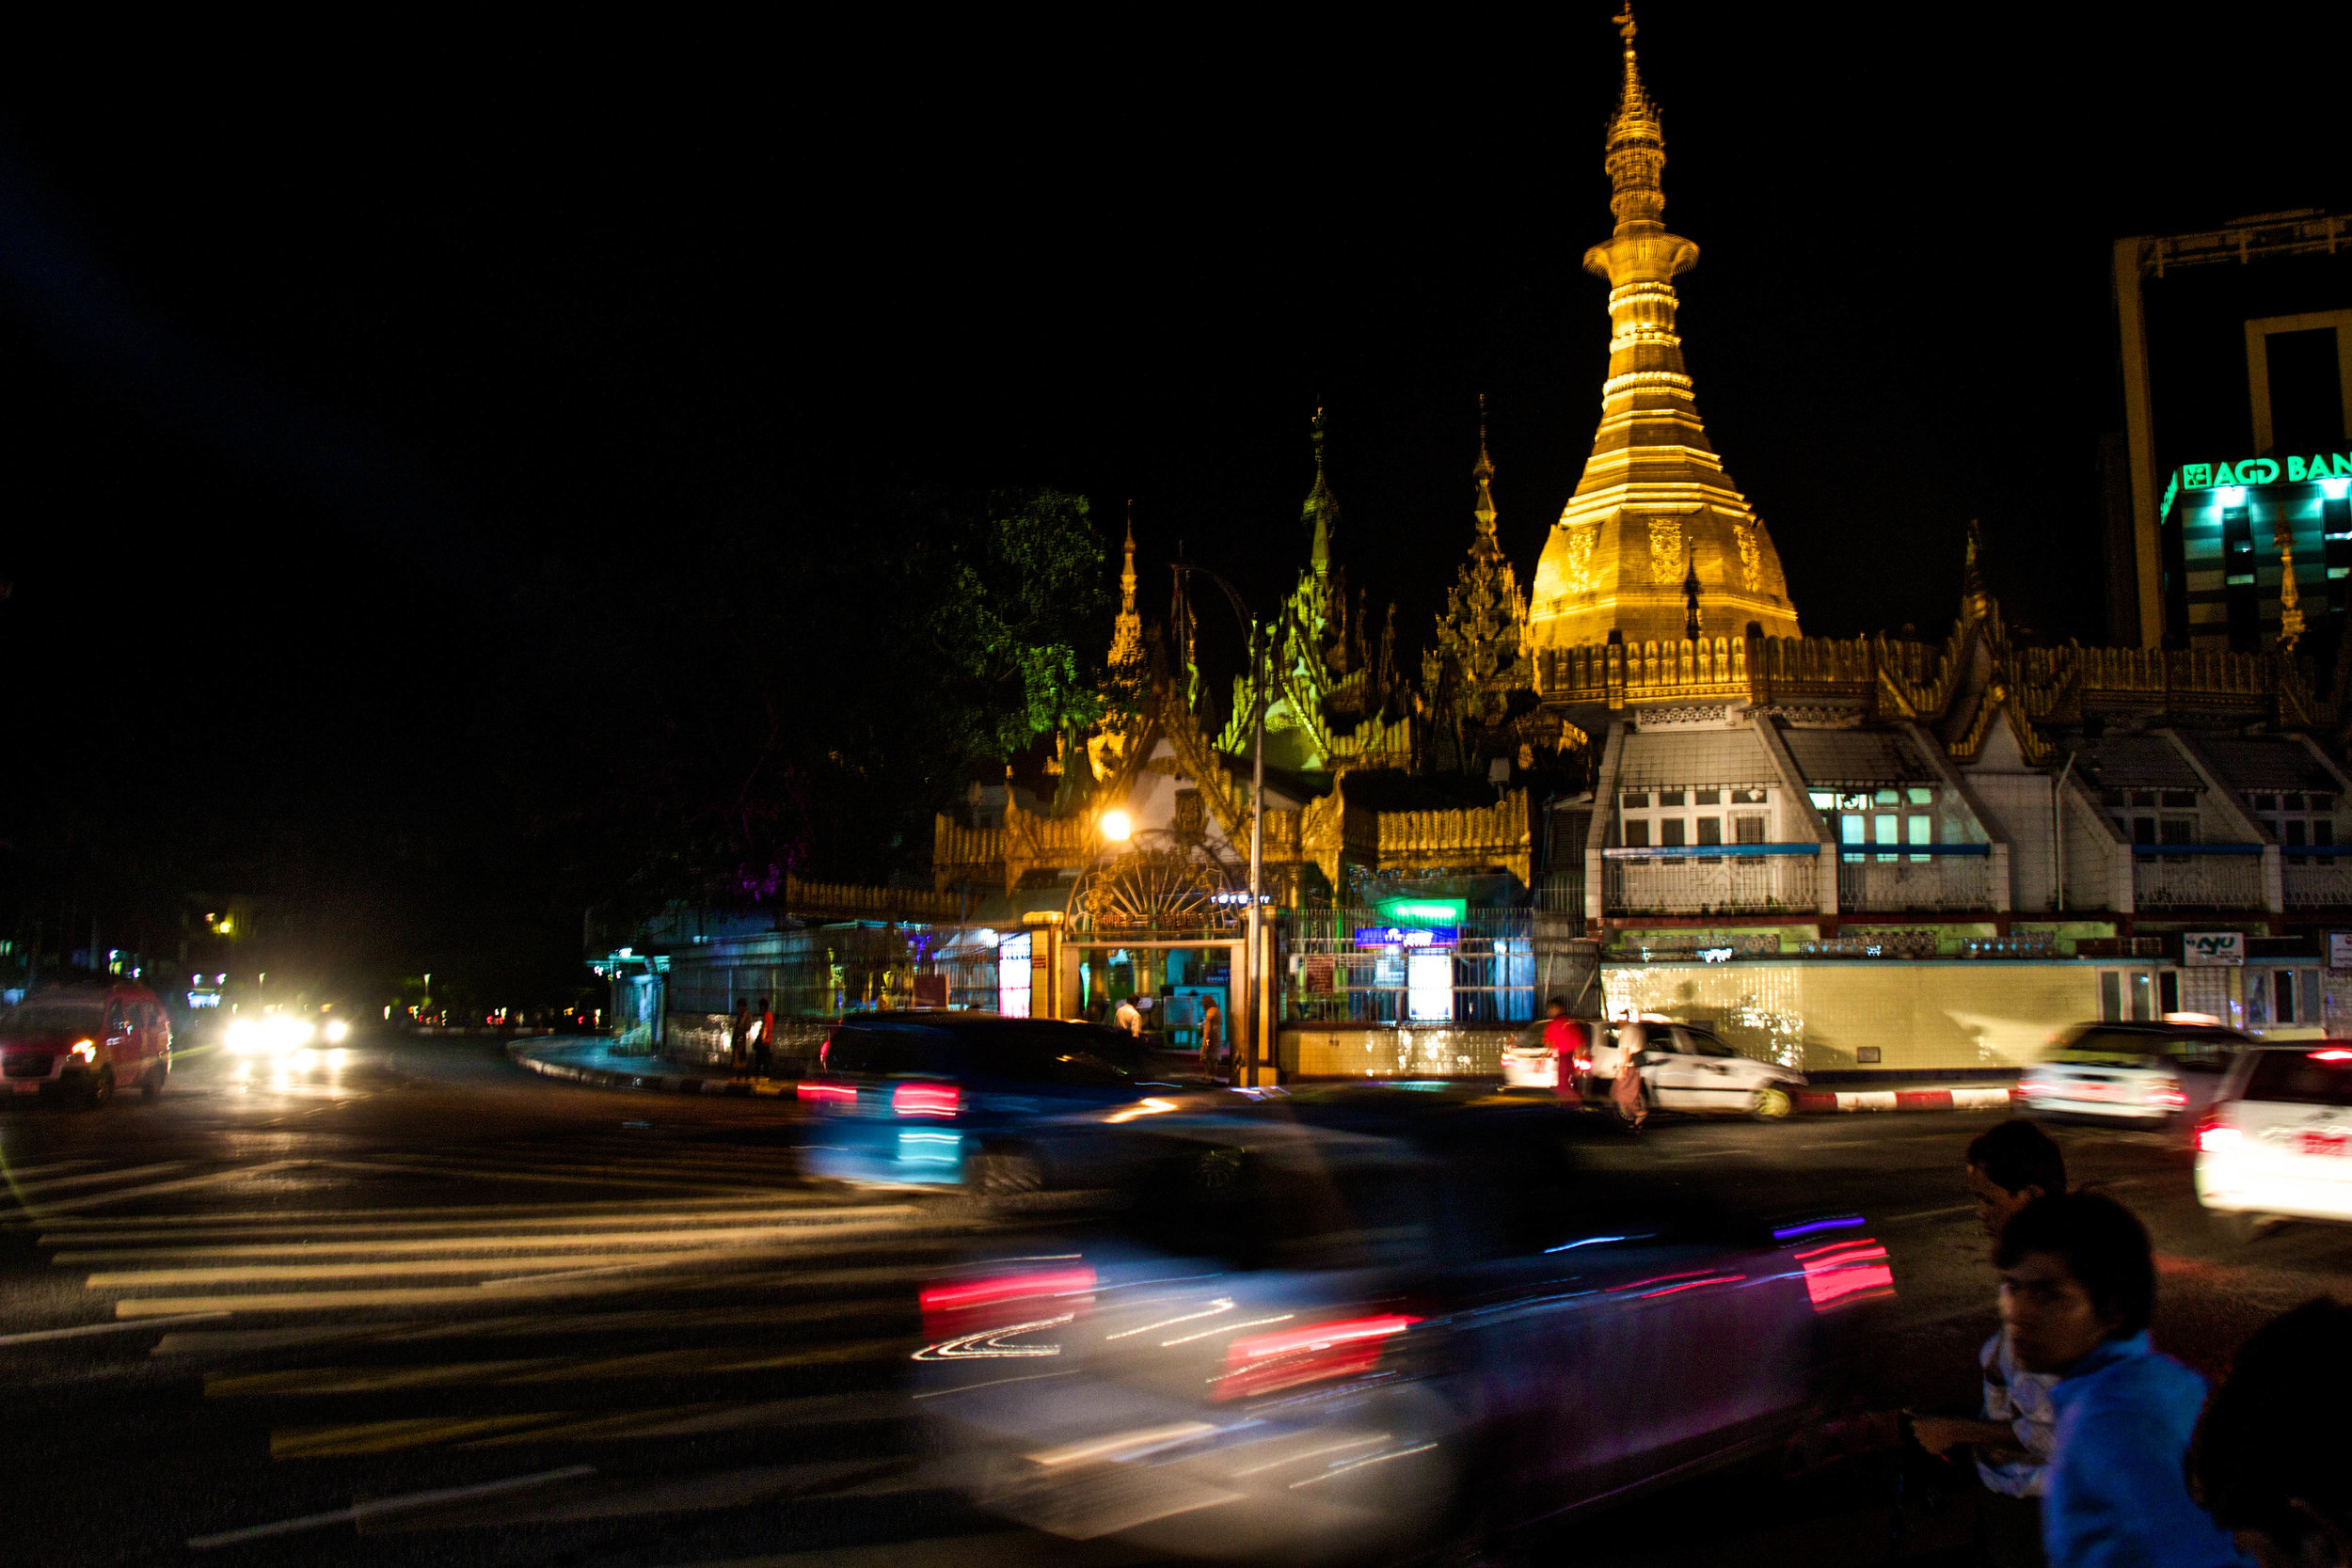 rangoon burma yangon myanmar 2-2.jpg